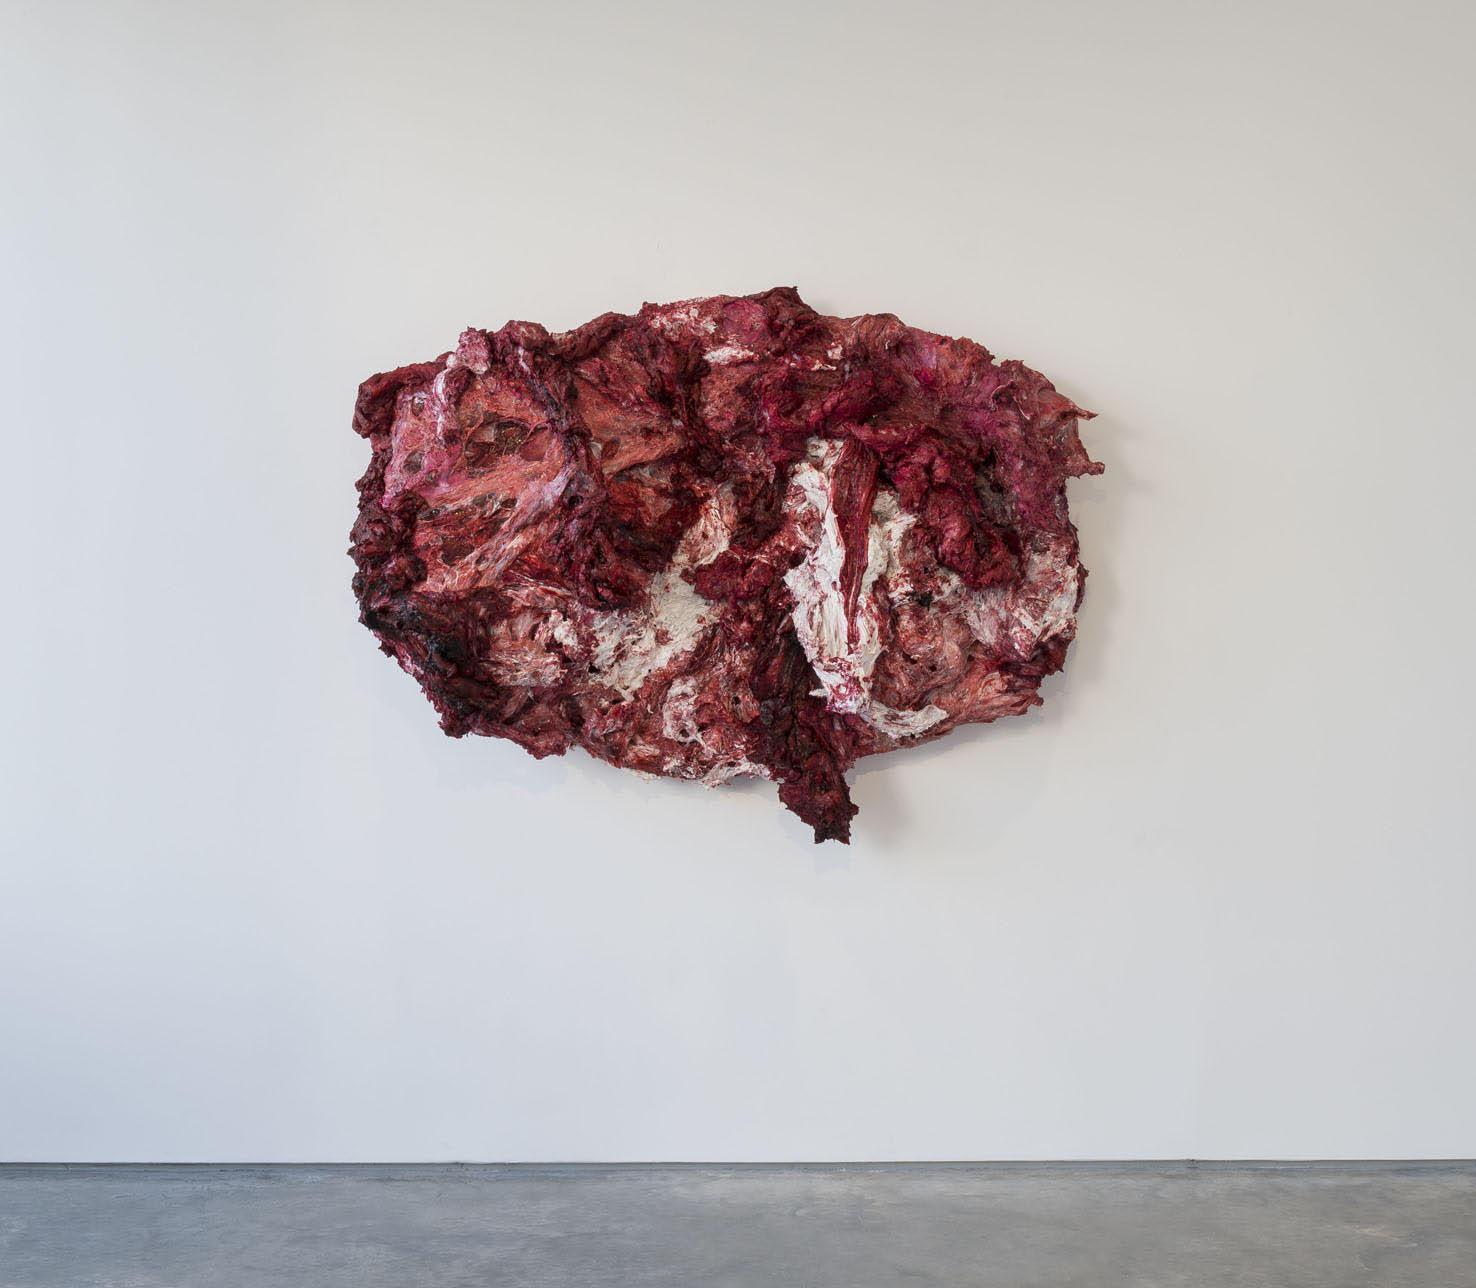 Anish Kapoor <em>Disrobe</em>, 2013. Silicone and pigment 140 x 188 x 55 cm © the artist; Courtesy, Lisson Gallery, London (image ref #: KAPO150015)